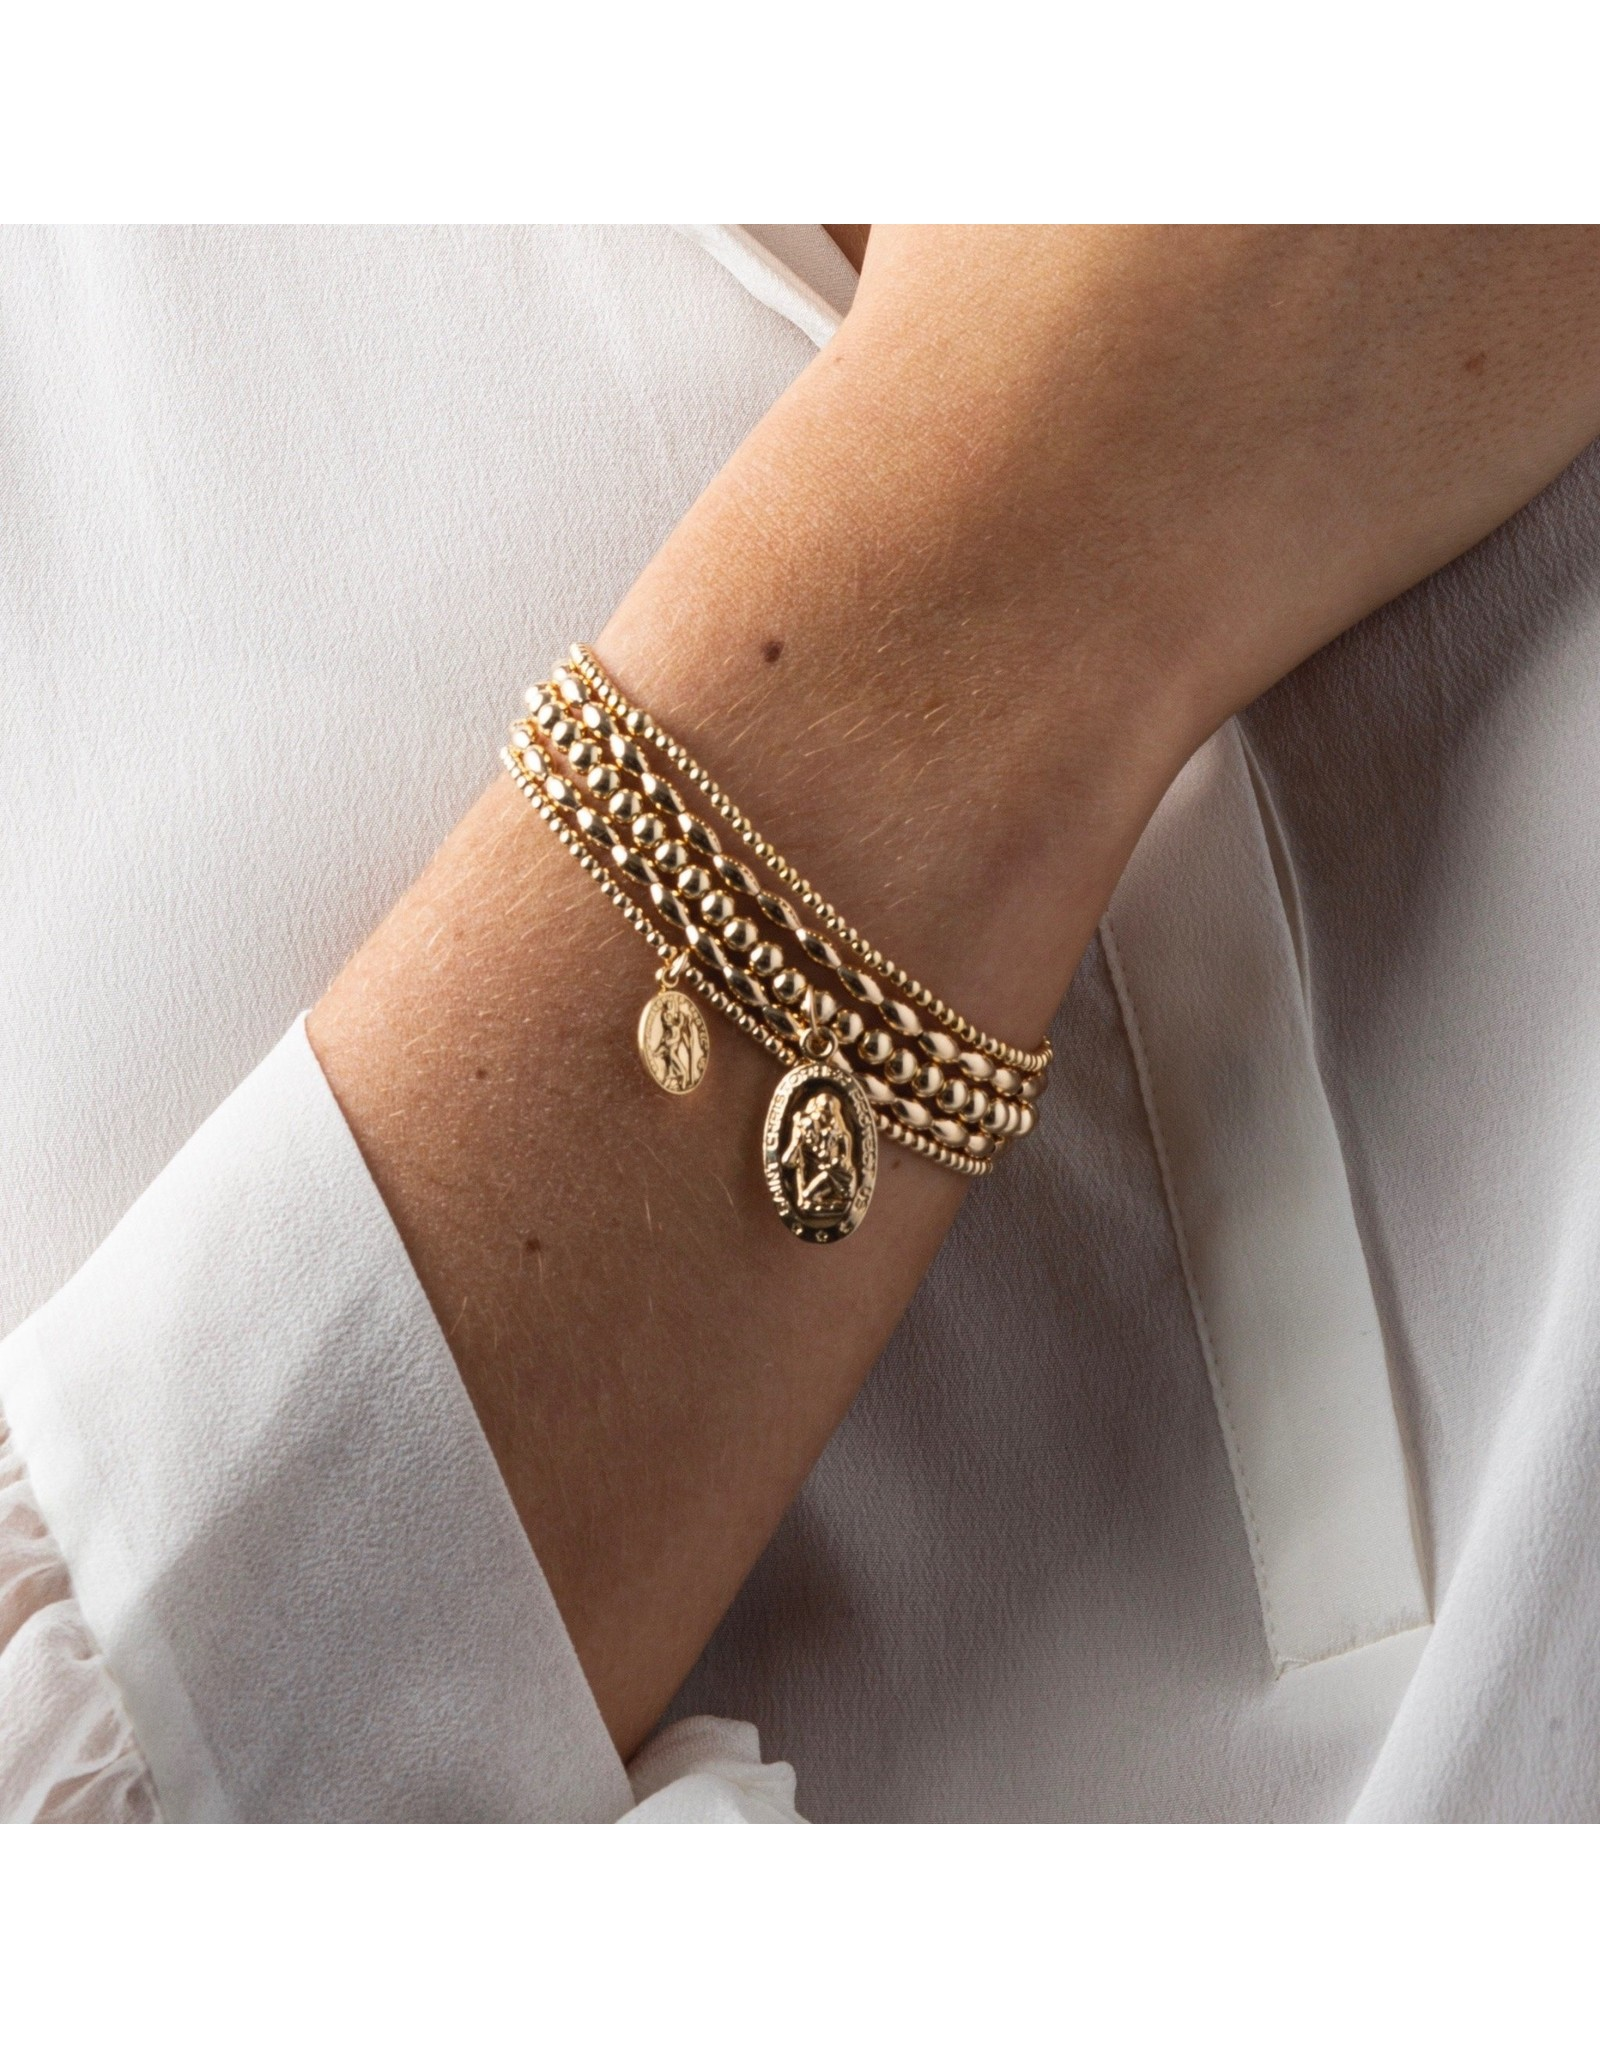 Oak + Arrow Interiors Classic Gold 2mm Bead Bracelet - Protection Small Gold Charm